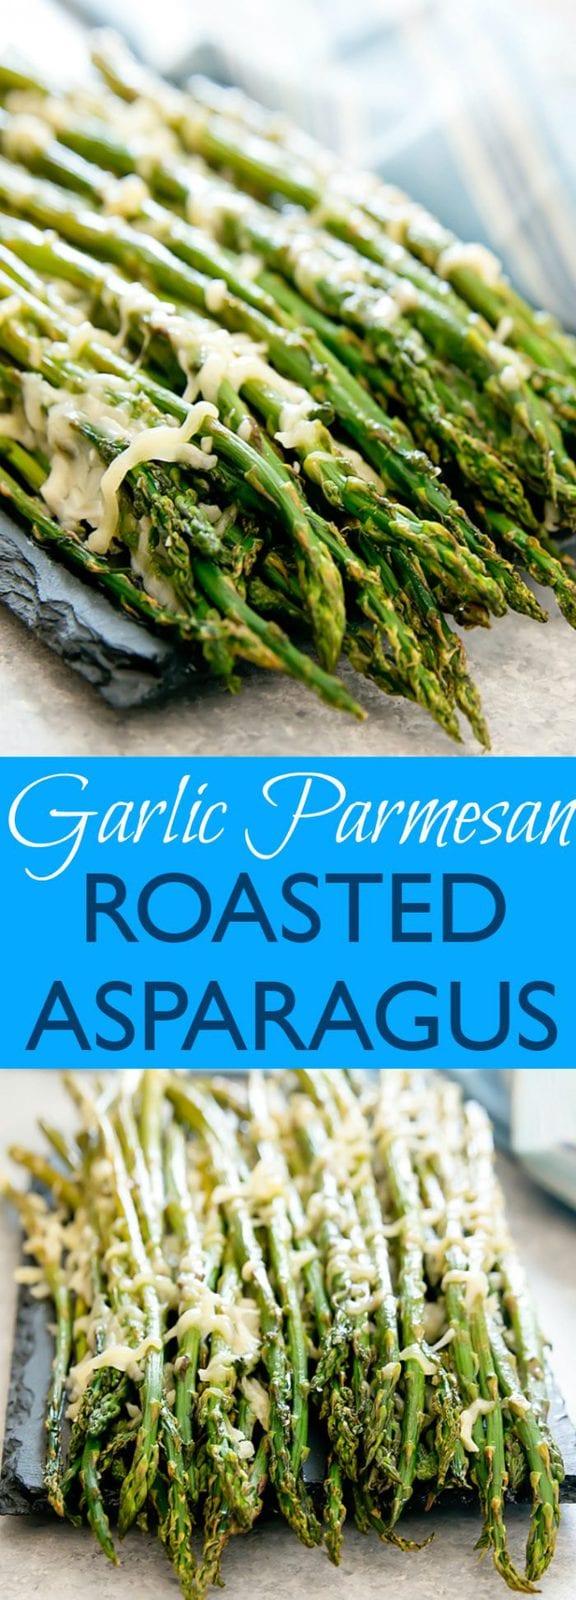 Easy Garlic Parmesan Roasted Asparagus